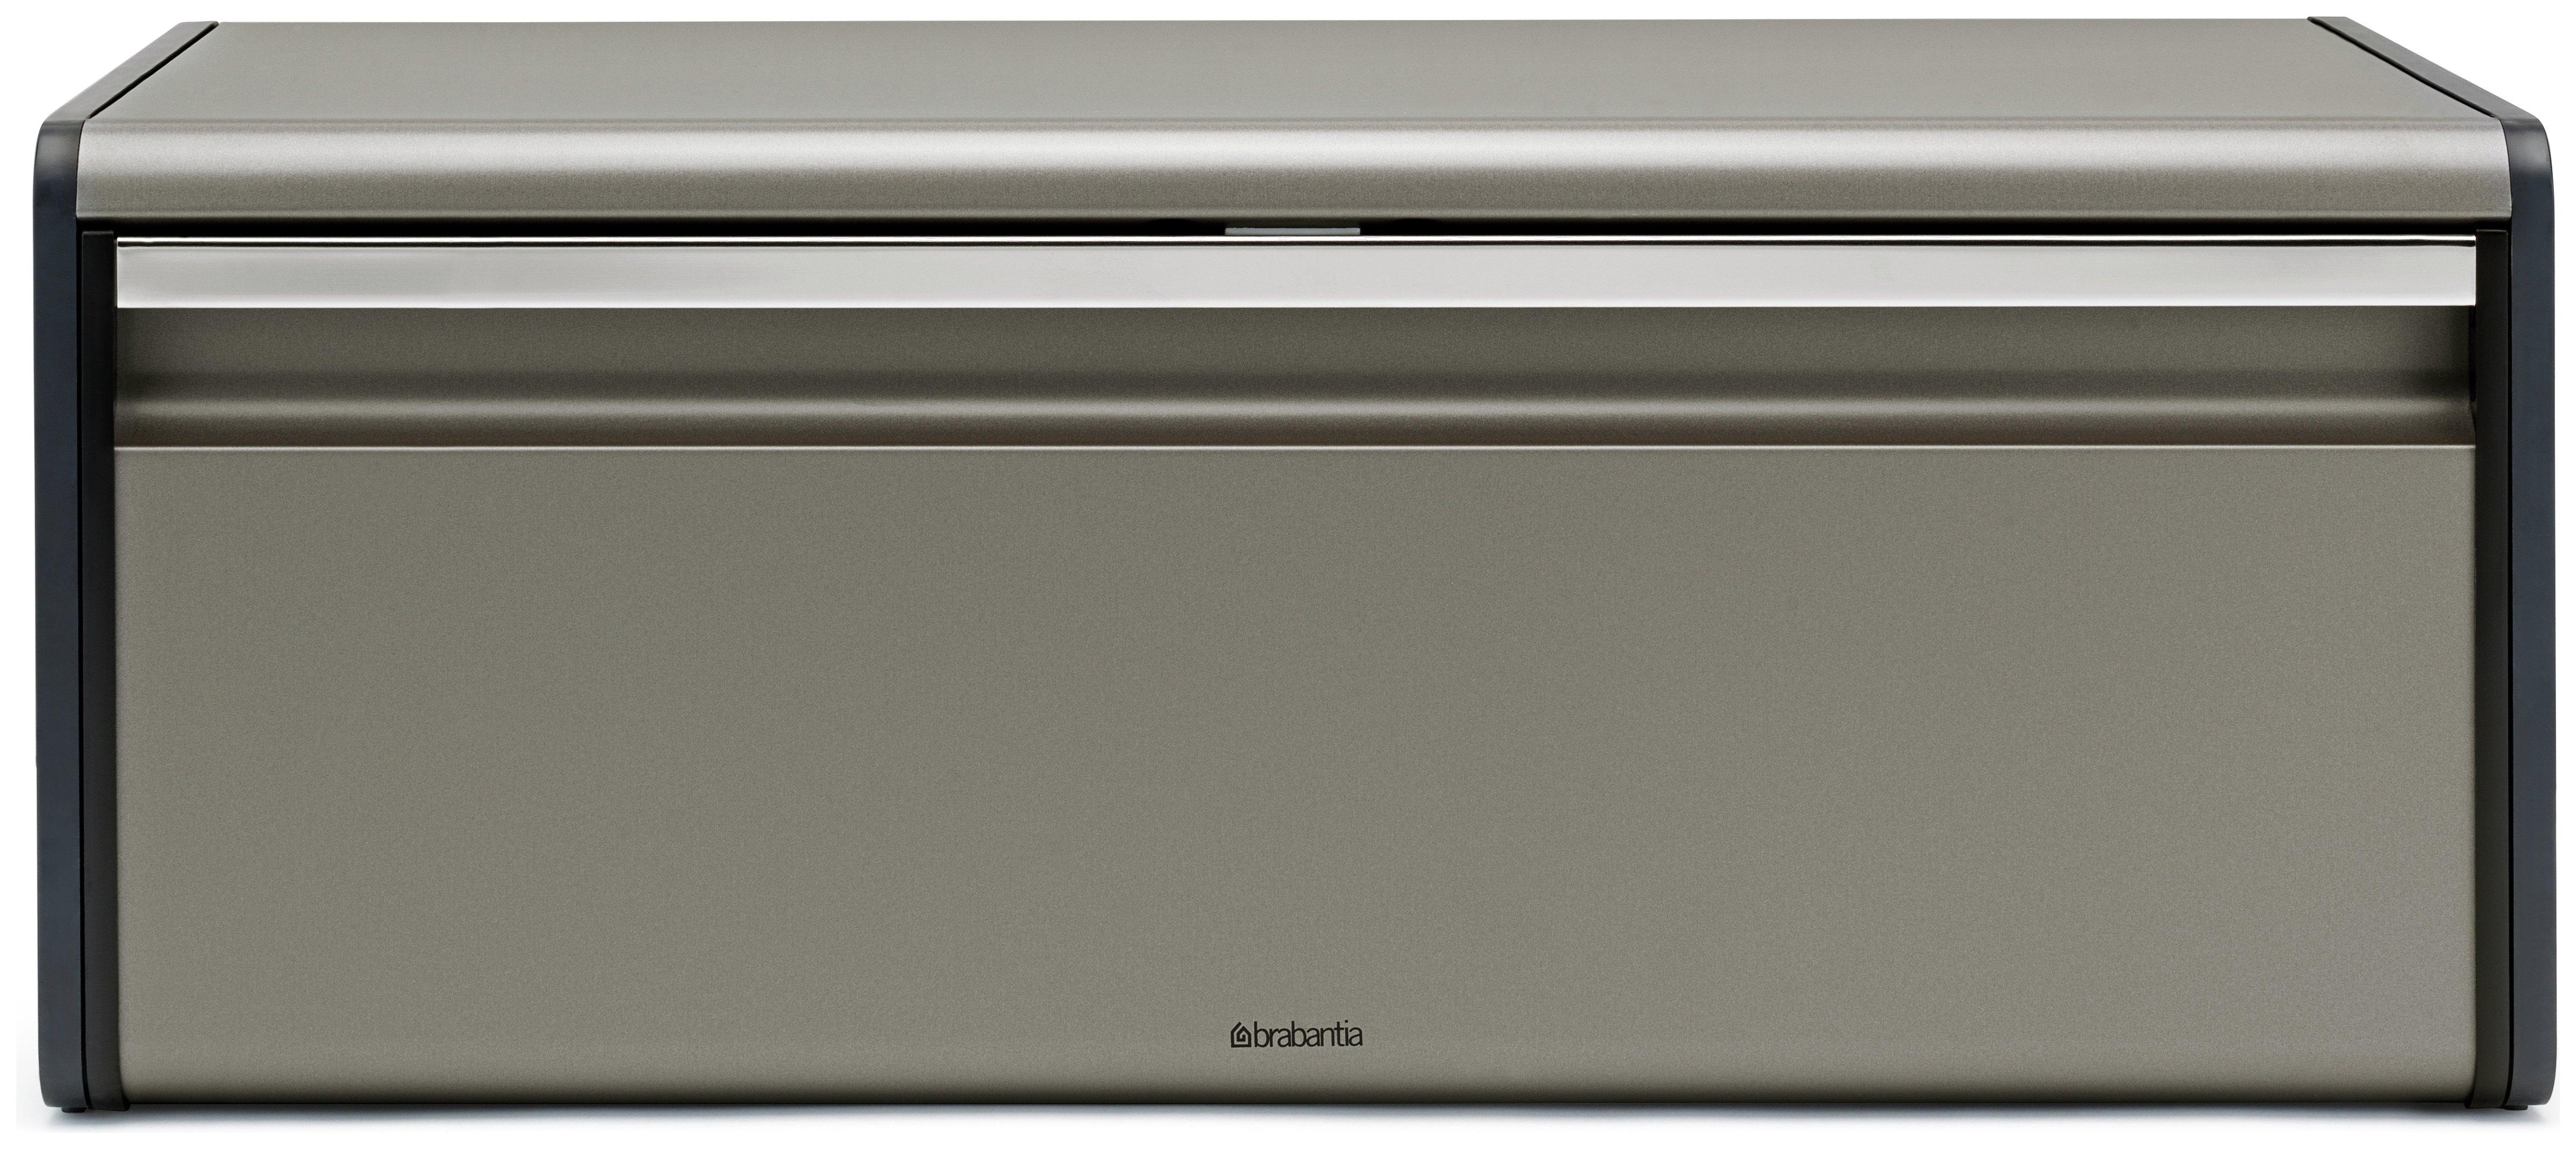 Image of Brabantia - Fall Front Bread Bin - Platinum